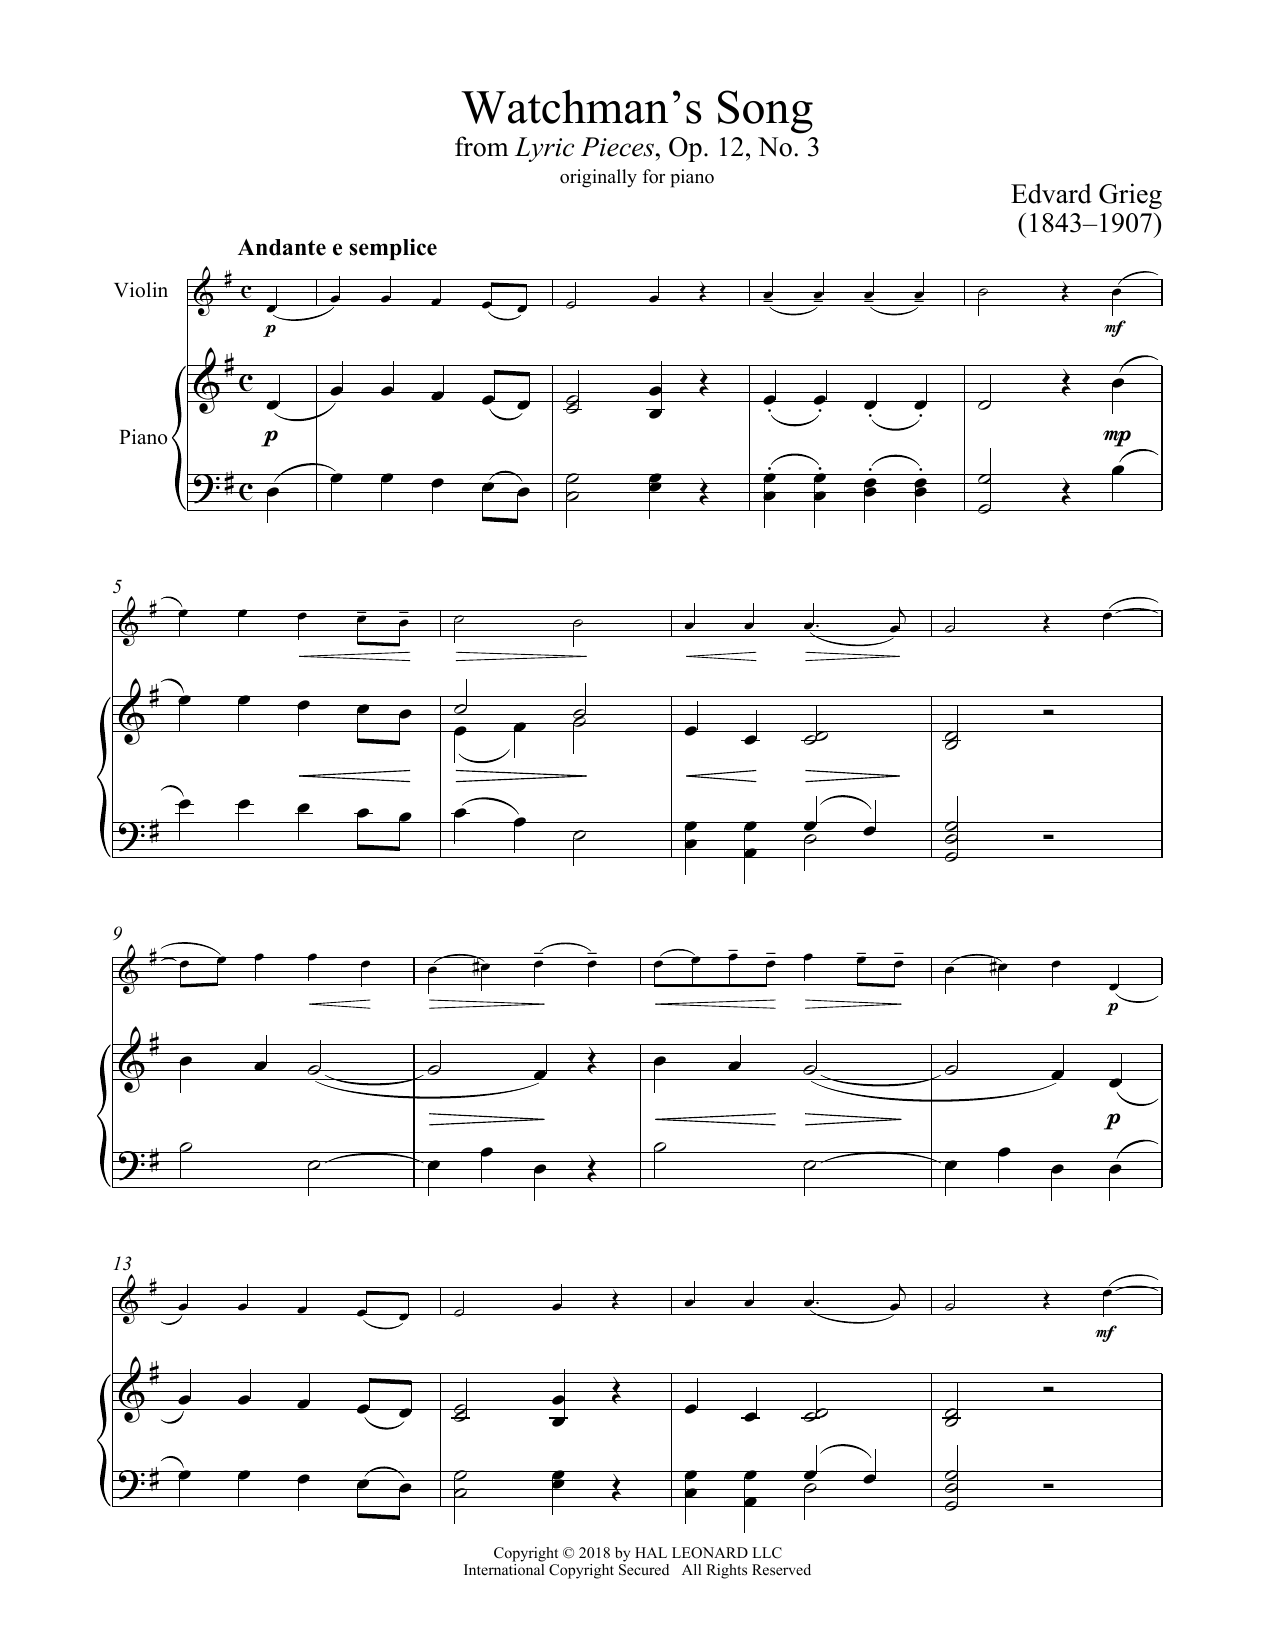 Watchman's Song, Op. 12, No. 3 (Violin and Piano)